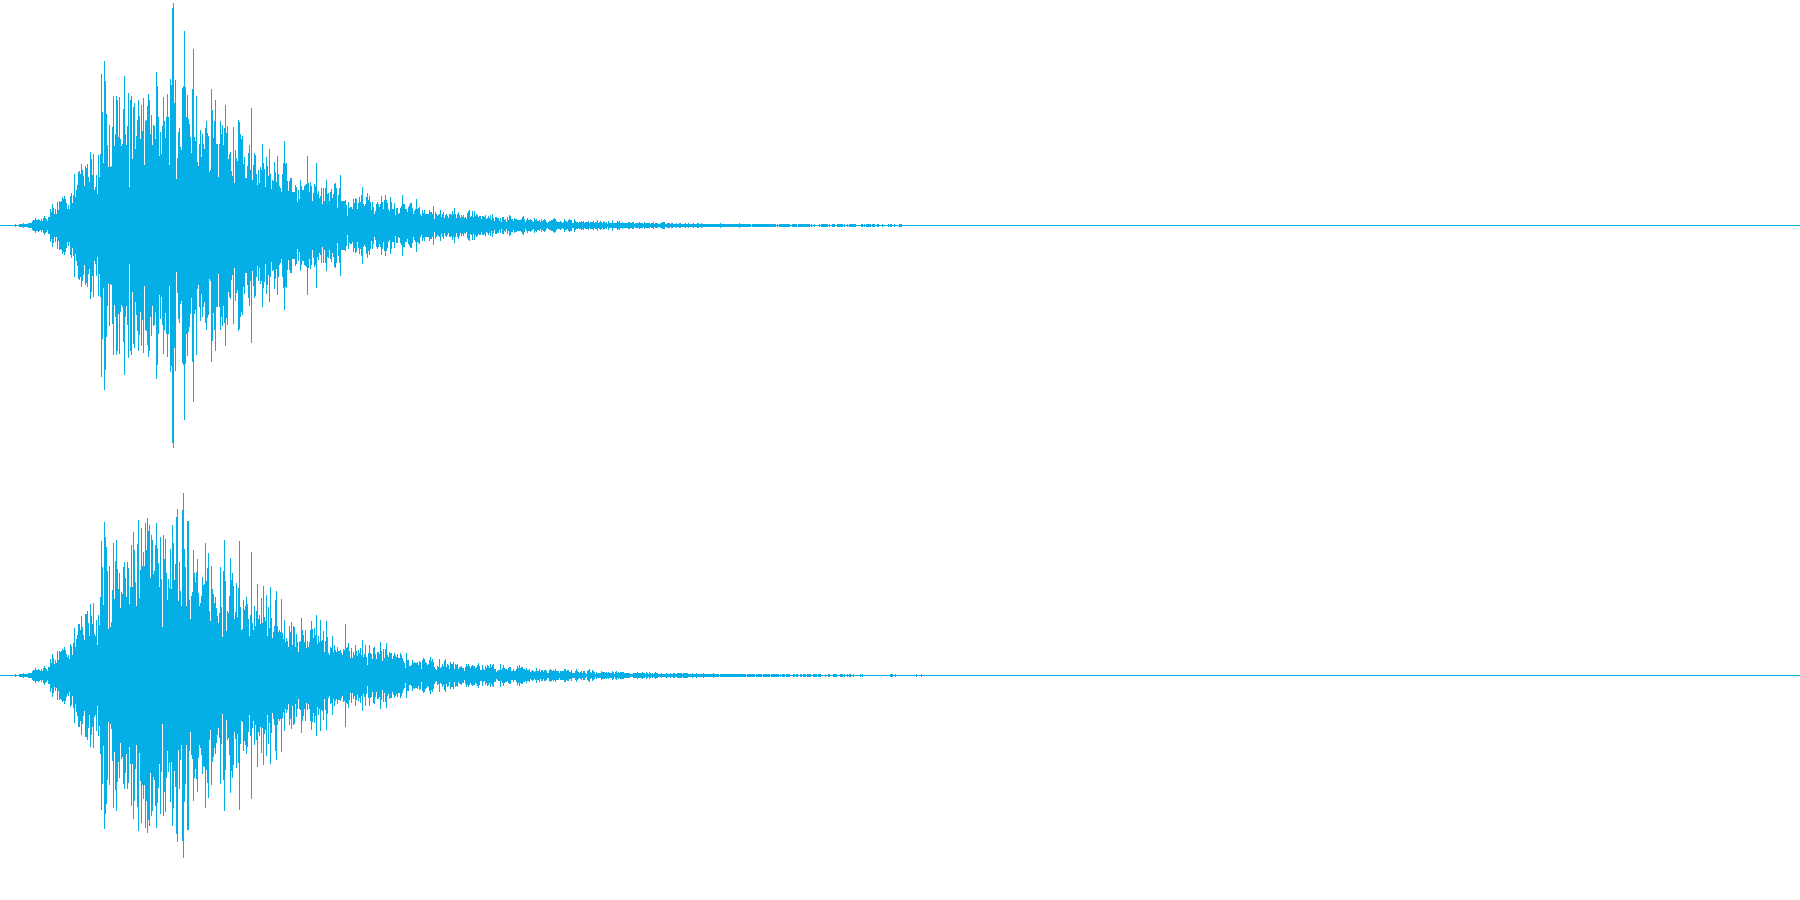 Battle 戦闘エフェクト音 7の再生済みの波形